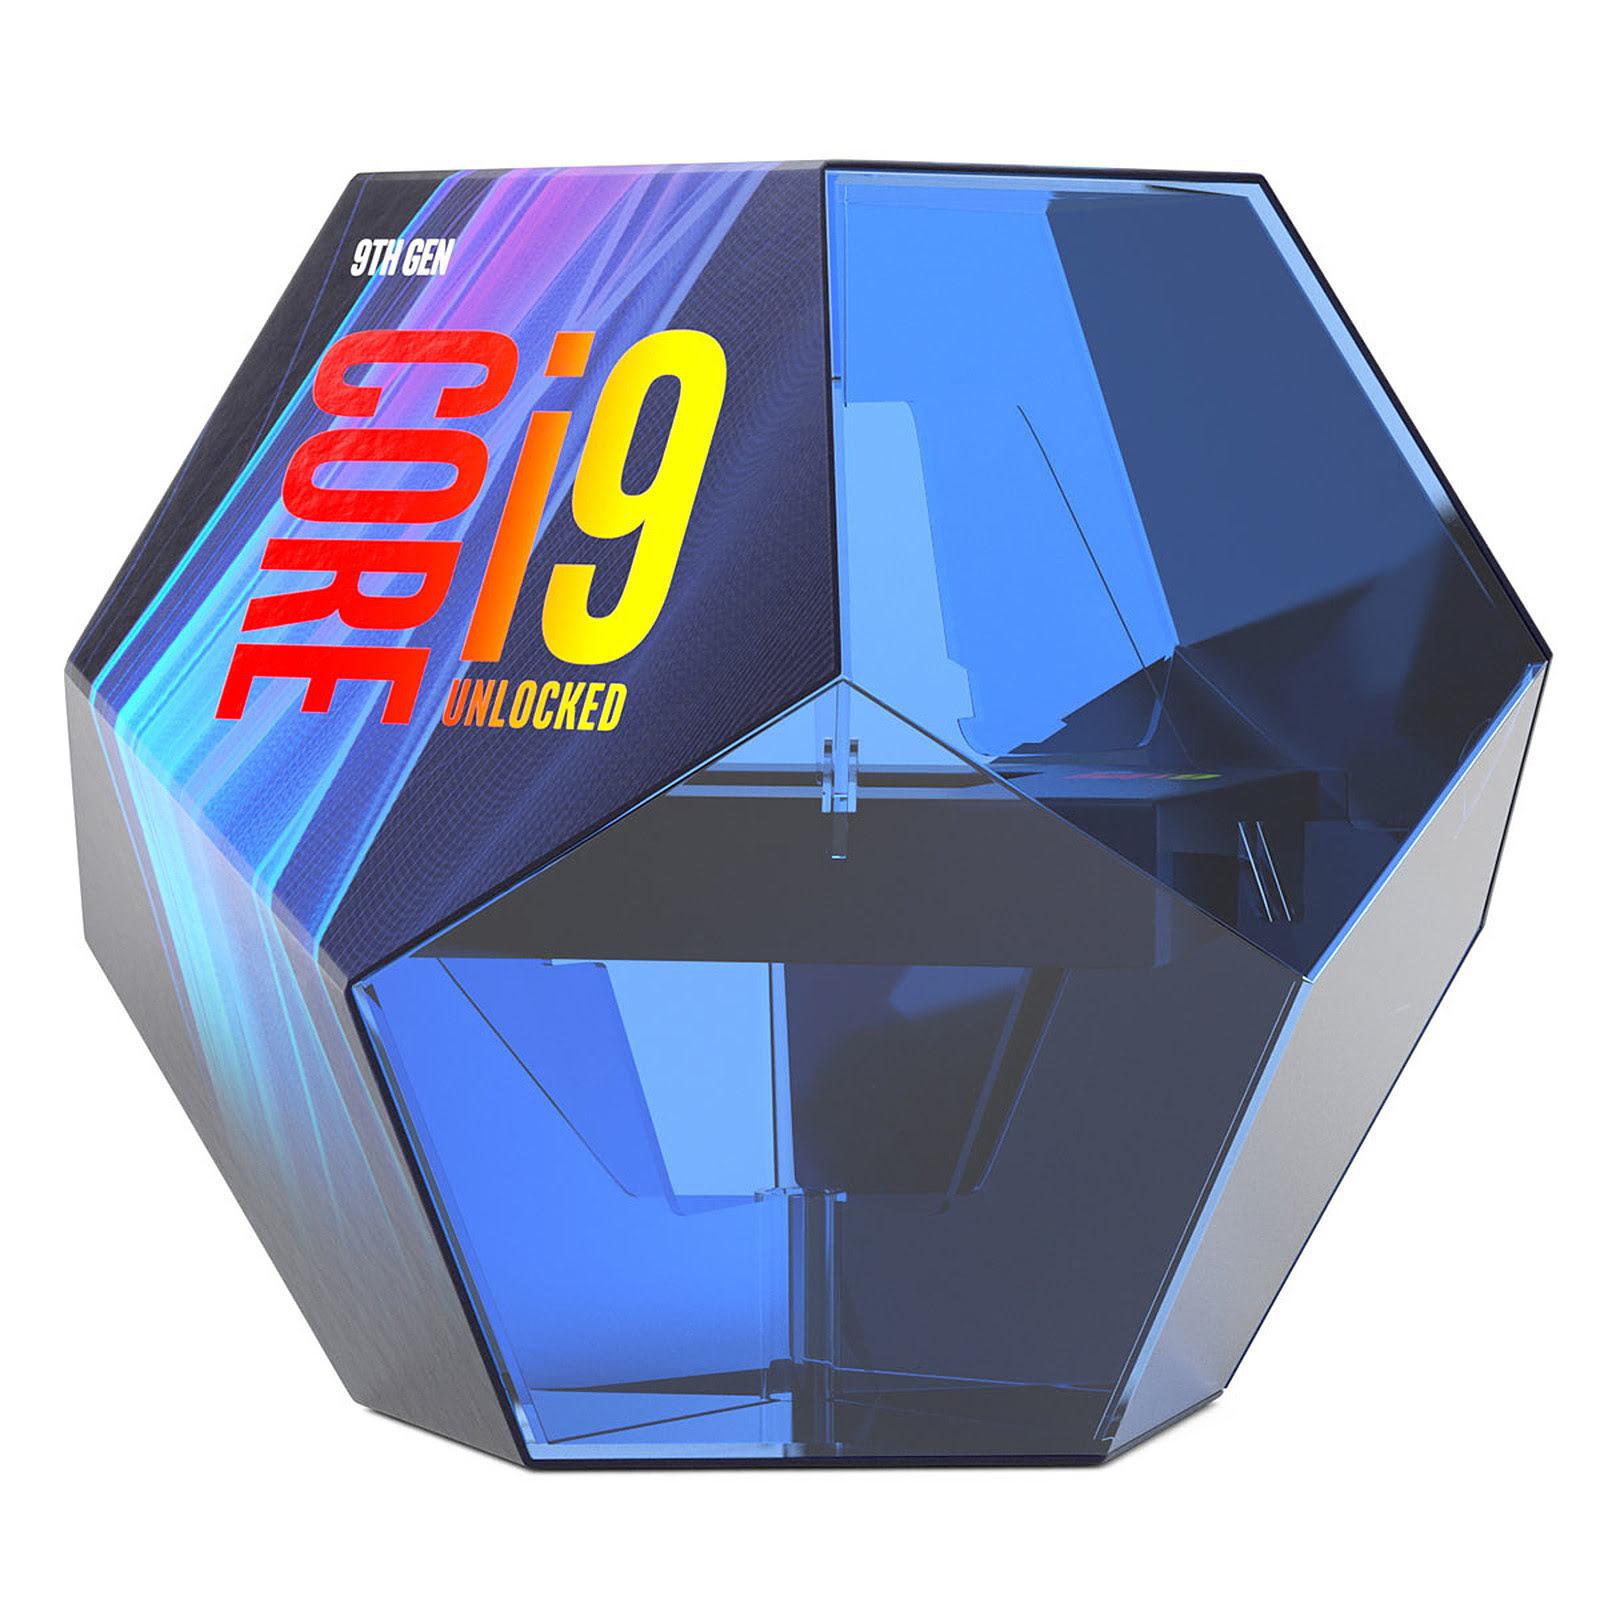 Intel Core i9-9900KS - 3.6GHz/LGA1151(2017)/Ss Vent./BOX (BX80684I99900KS) - Achat / Vente Processeur sur Cybertek.fr - 1